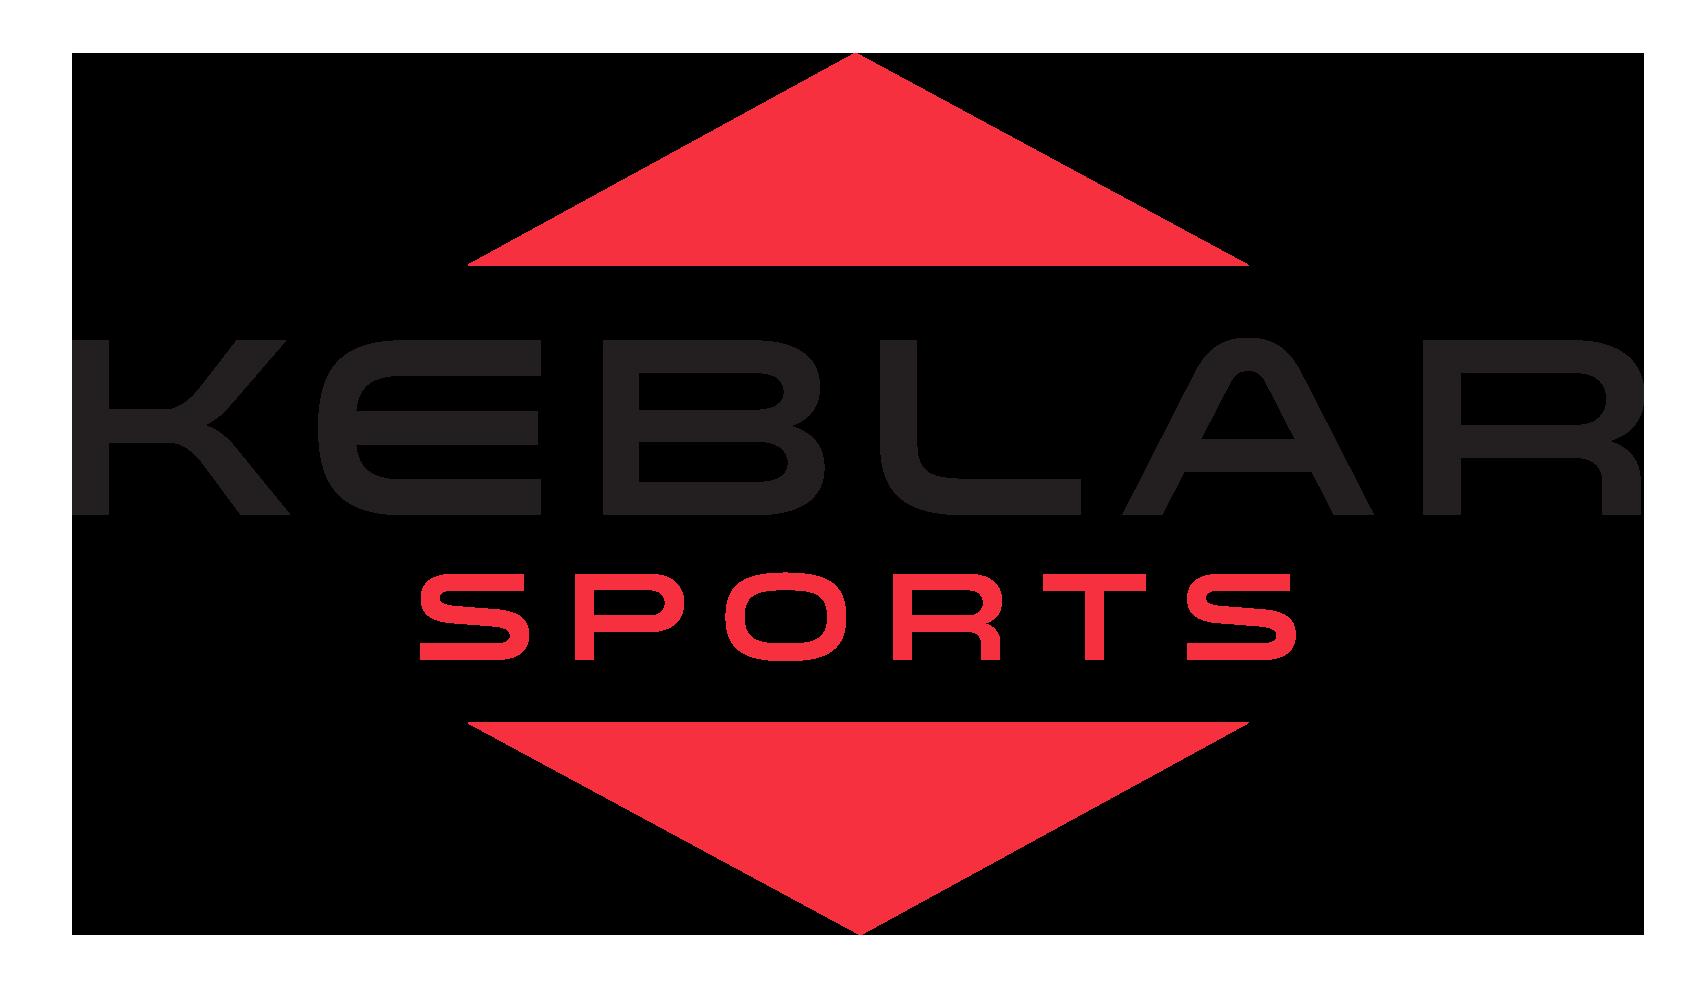 Keblar Sports